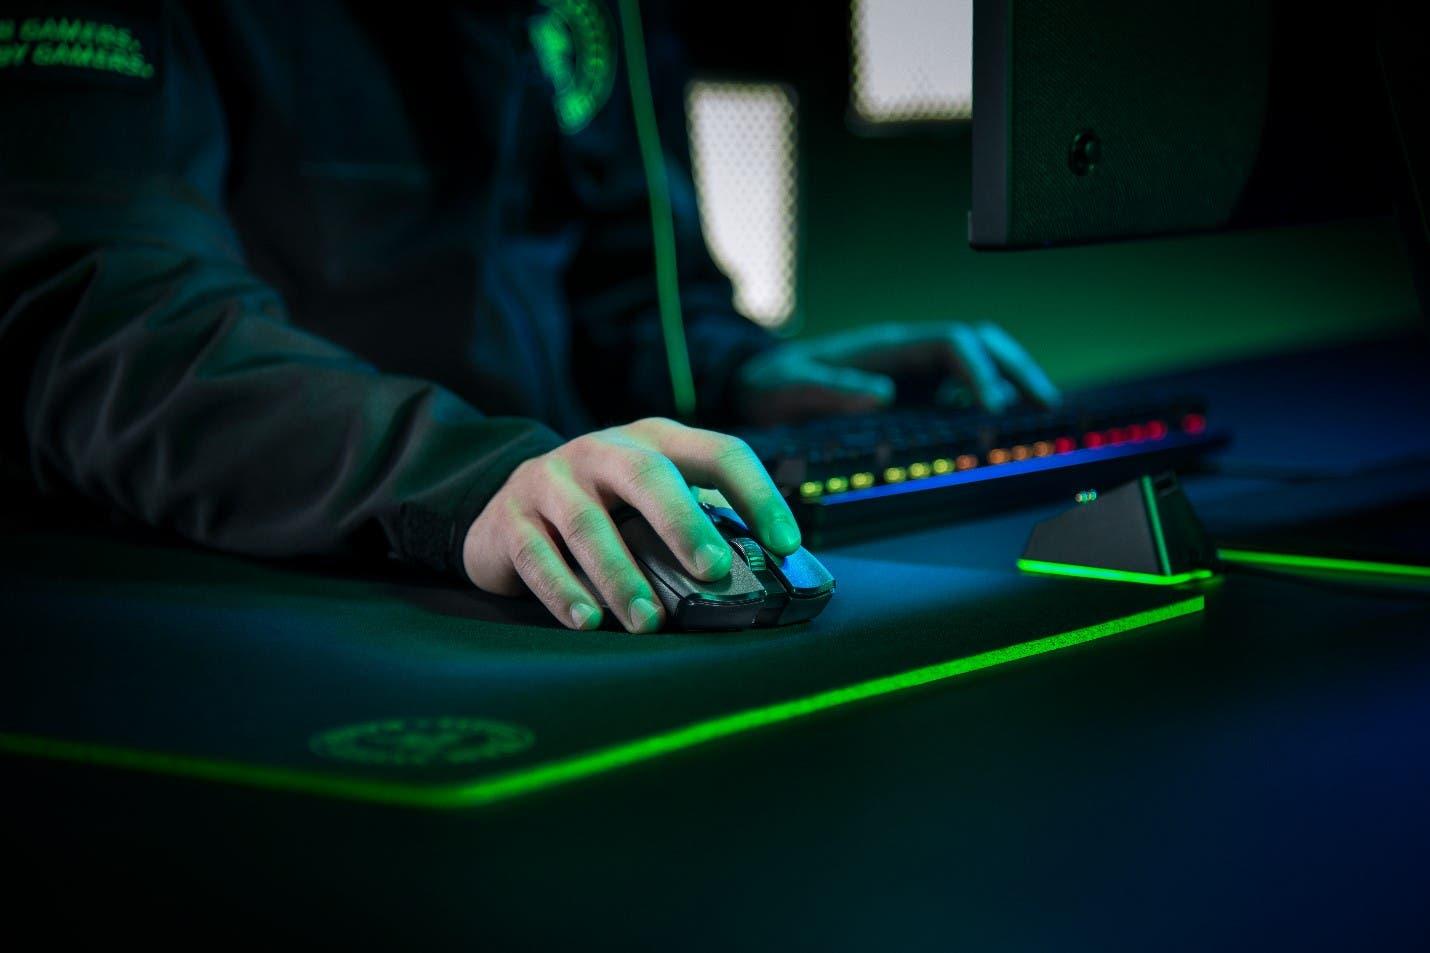 Este es el nuevo Razer Viper Ultimate Wireless, compatible con Xbox One 2